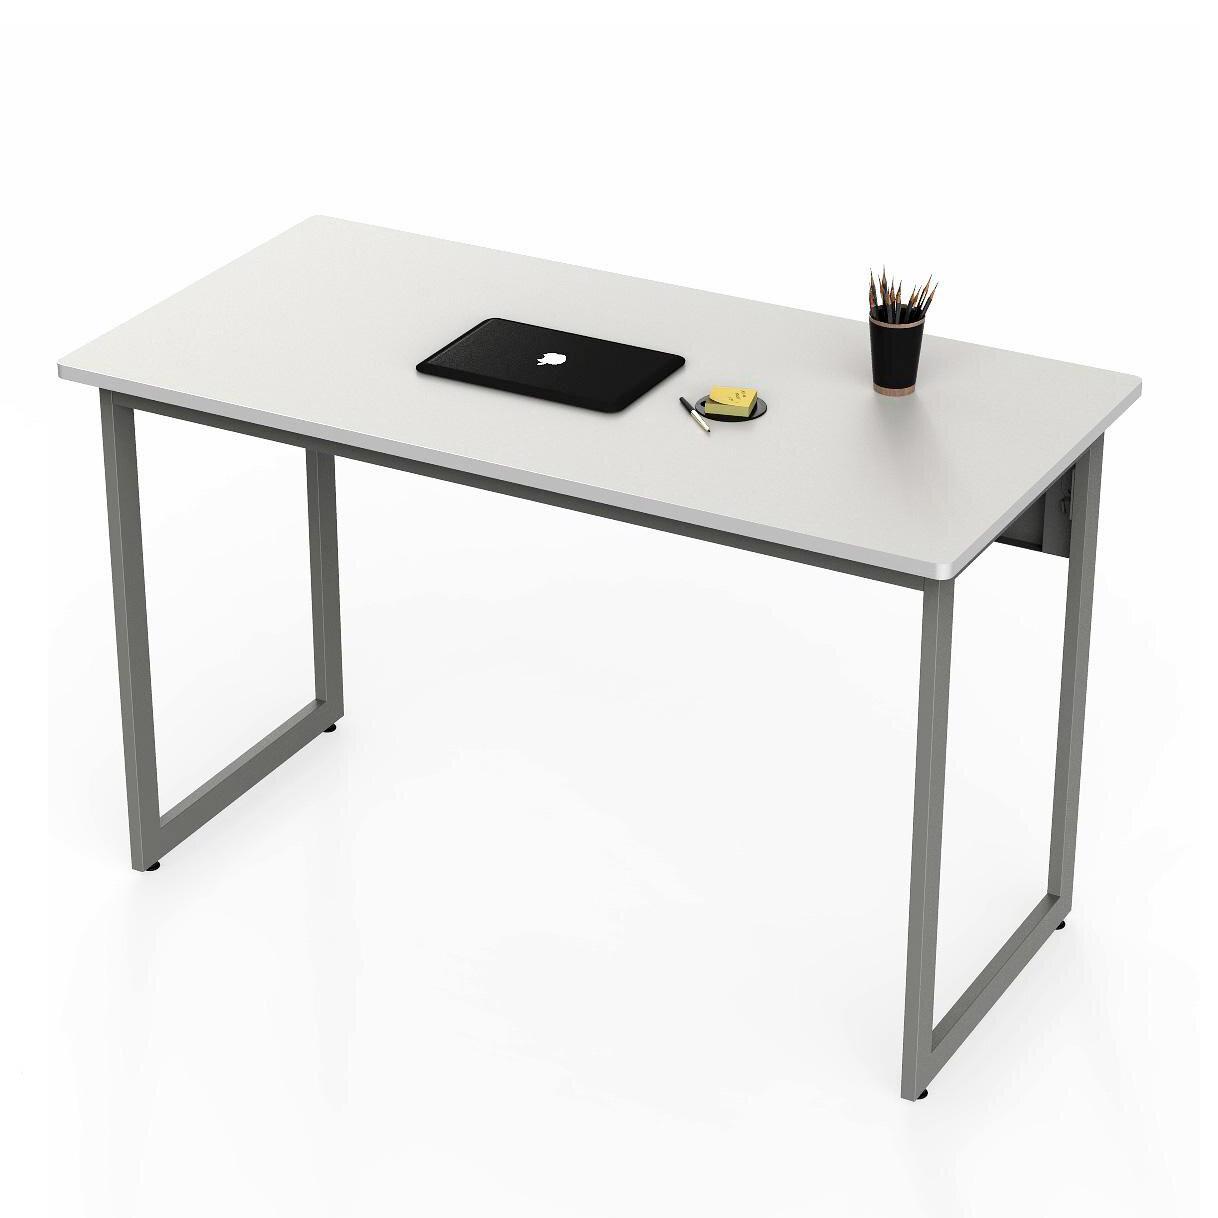 Awe Inspiring White Lacquer Office Desk Wayfair Ca Home Interior And Landscaping Pimpapssignezvosmurscom